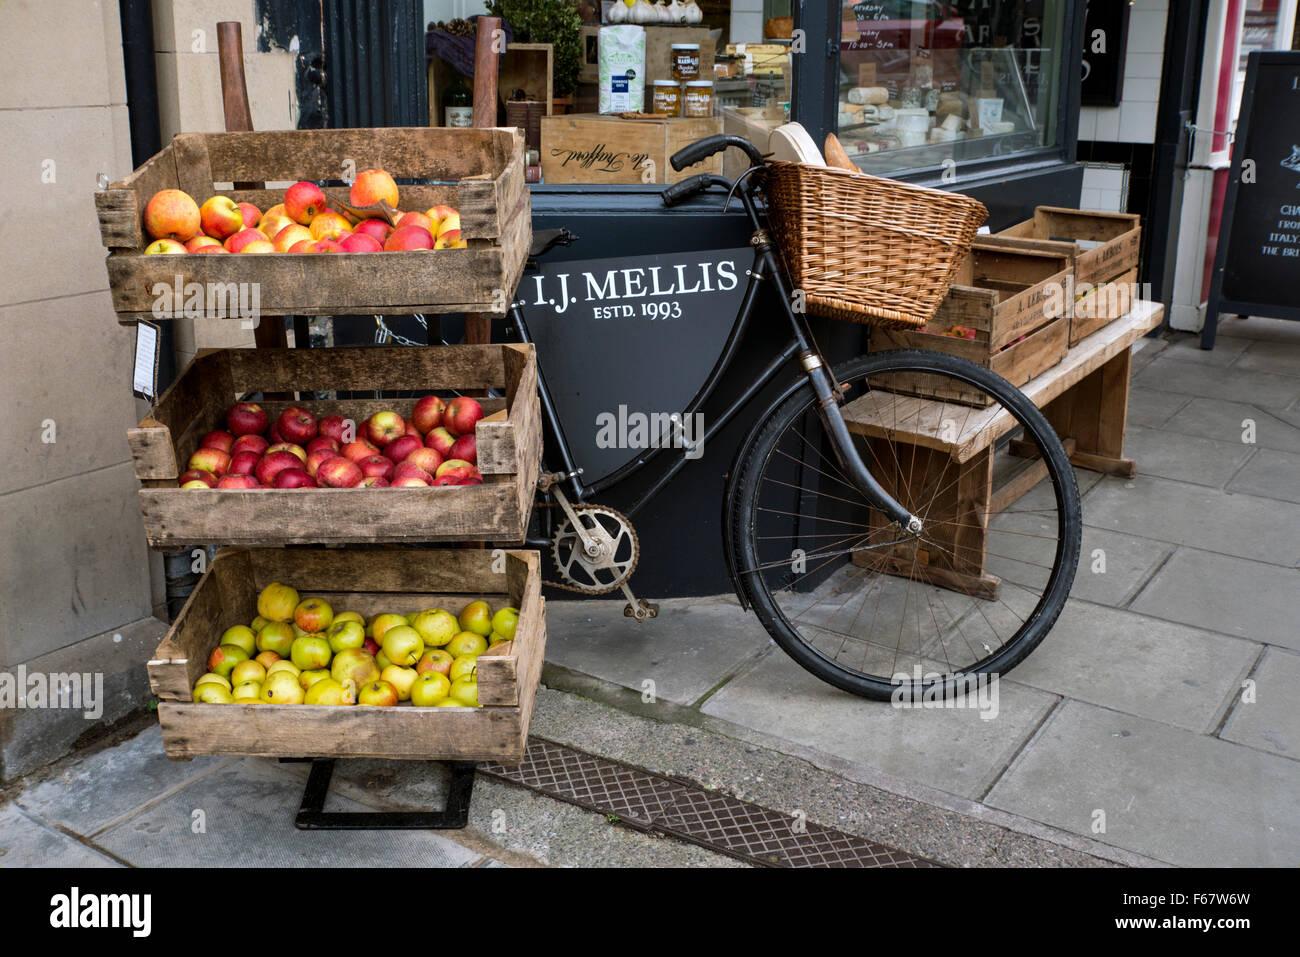 Cajas de manzanas en la pantalla fuera de la tienda de I J Mellis, queseras ubicadas en Stockbridge, Edimburgo. Imagen De Stock